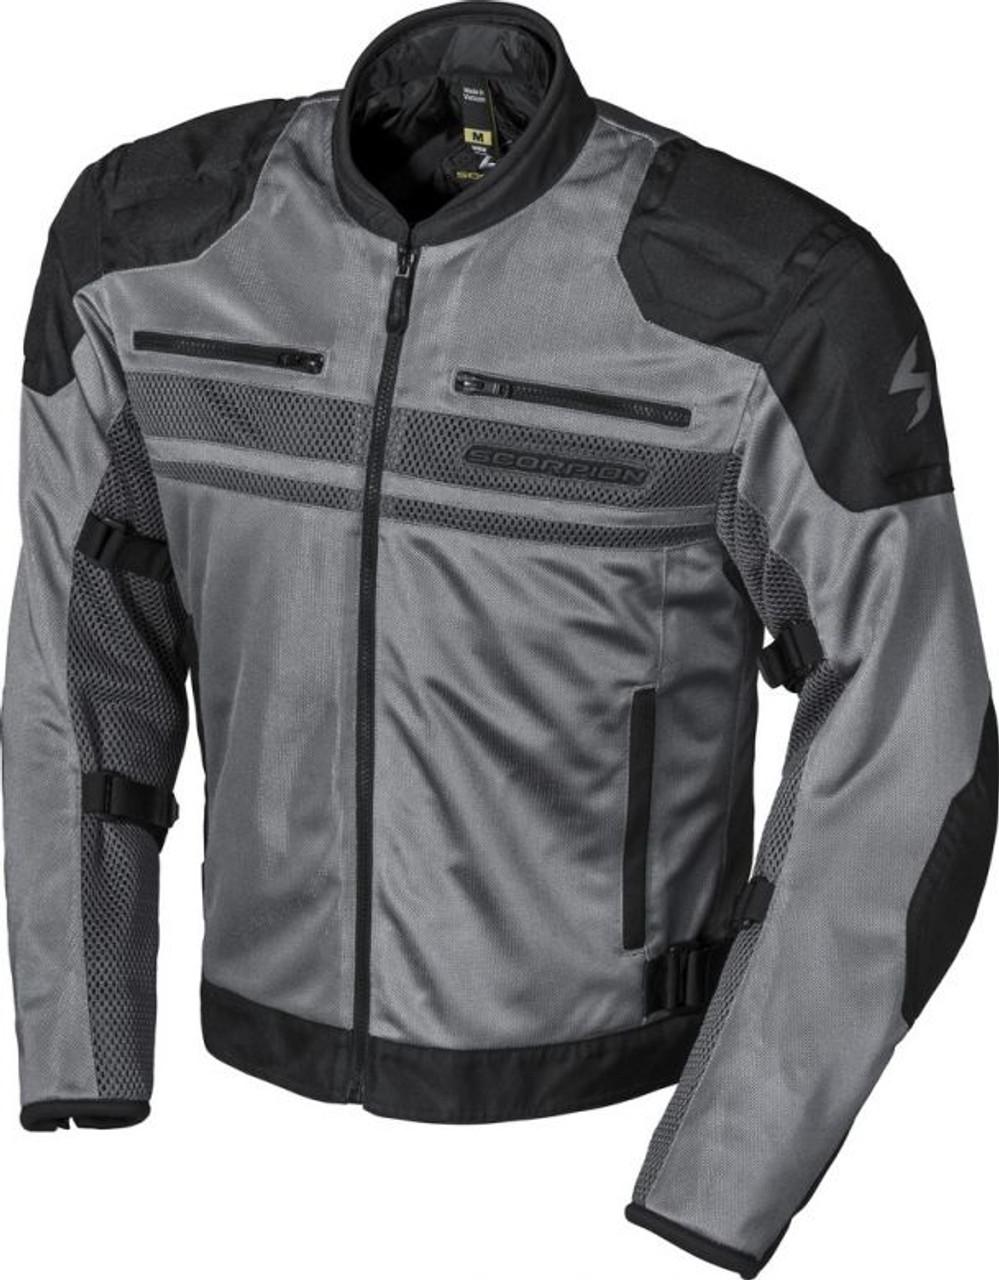 Oxford Spartan Mens Riding Jacket Black//Gray, 3X-Large